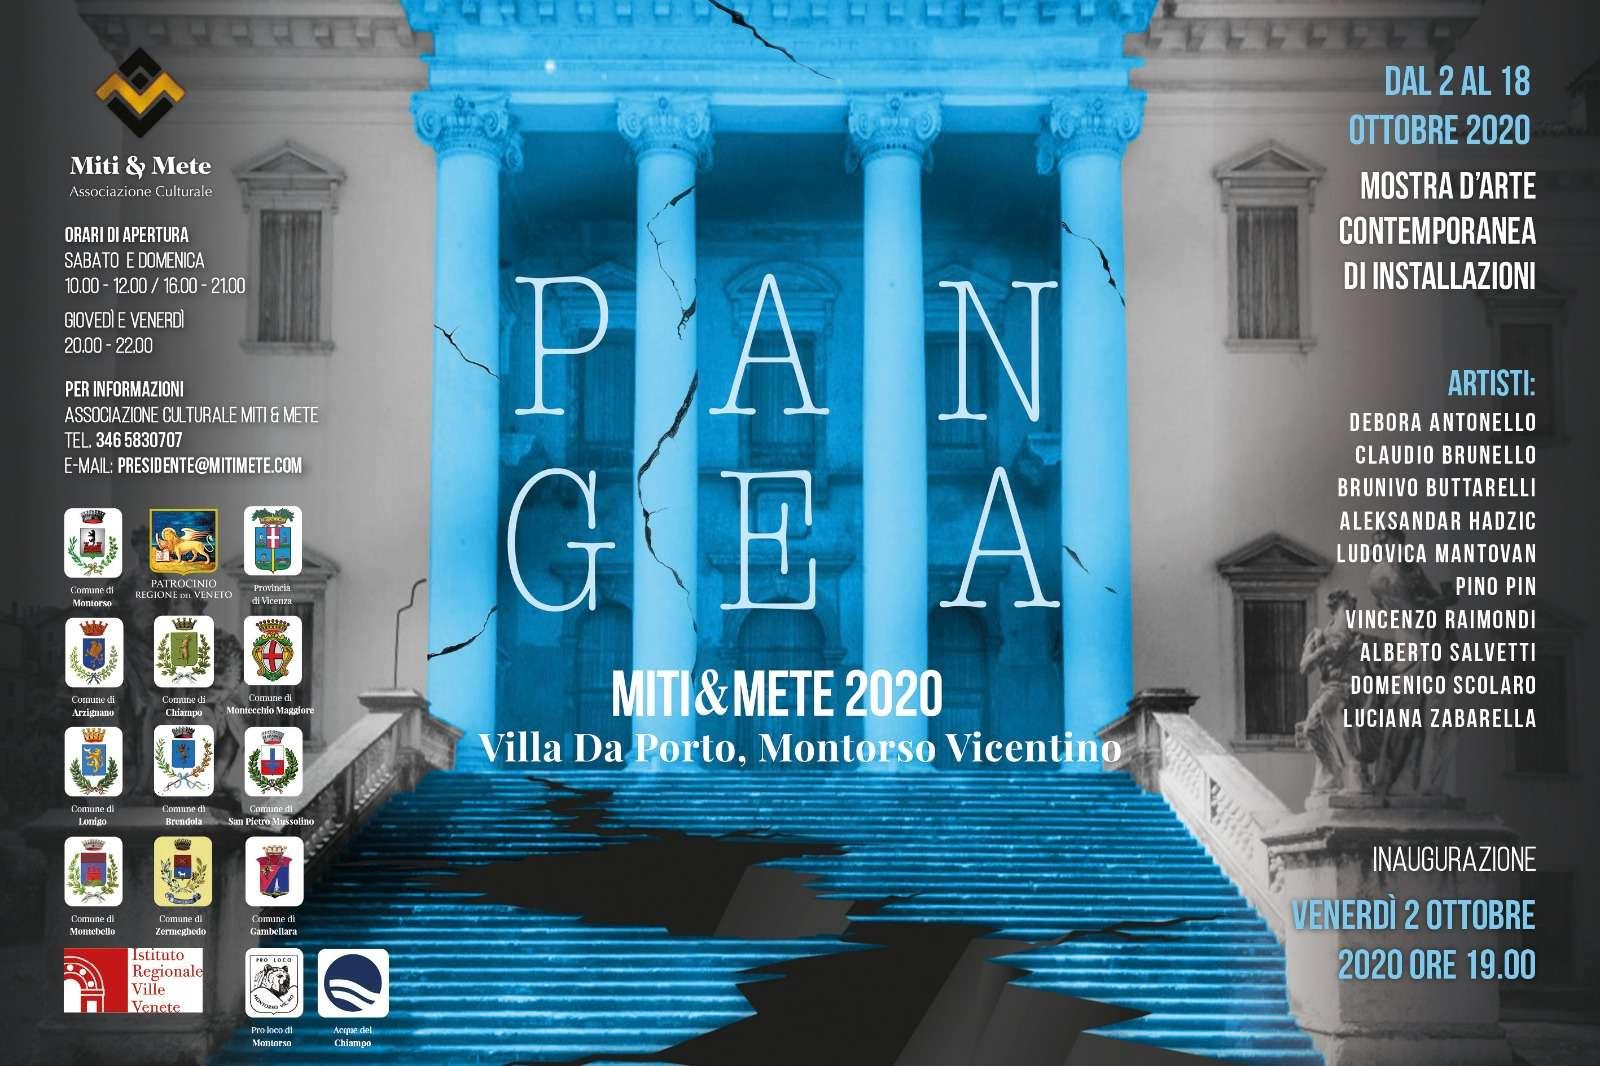 Pangea - Miti e Mete 2020